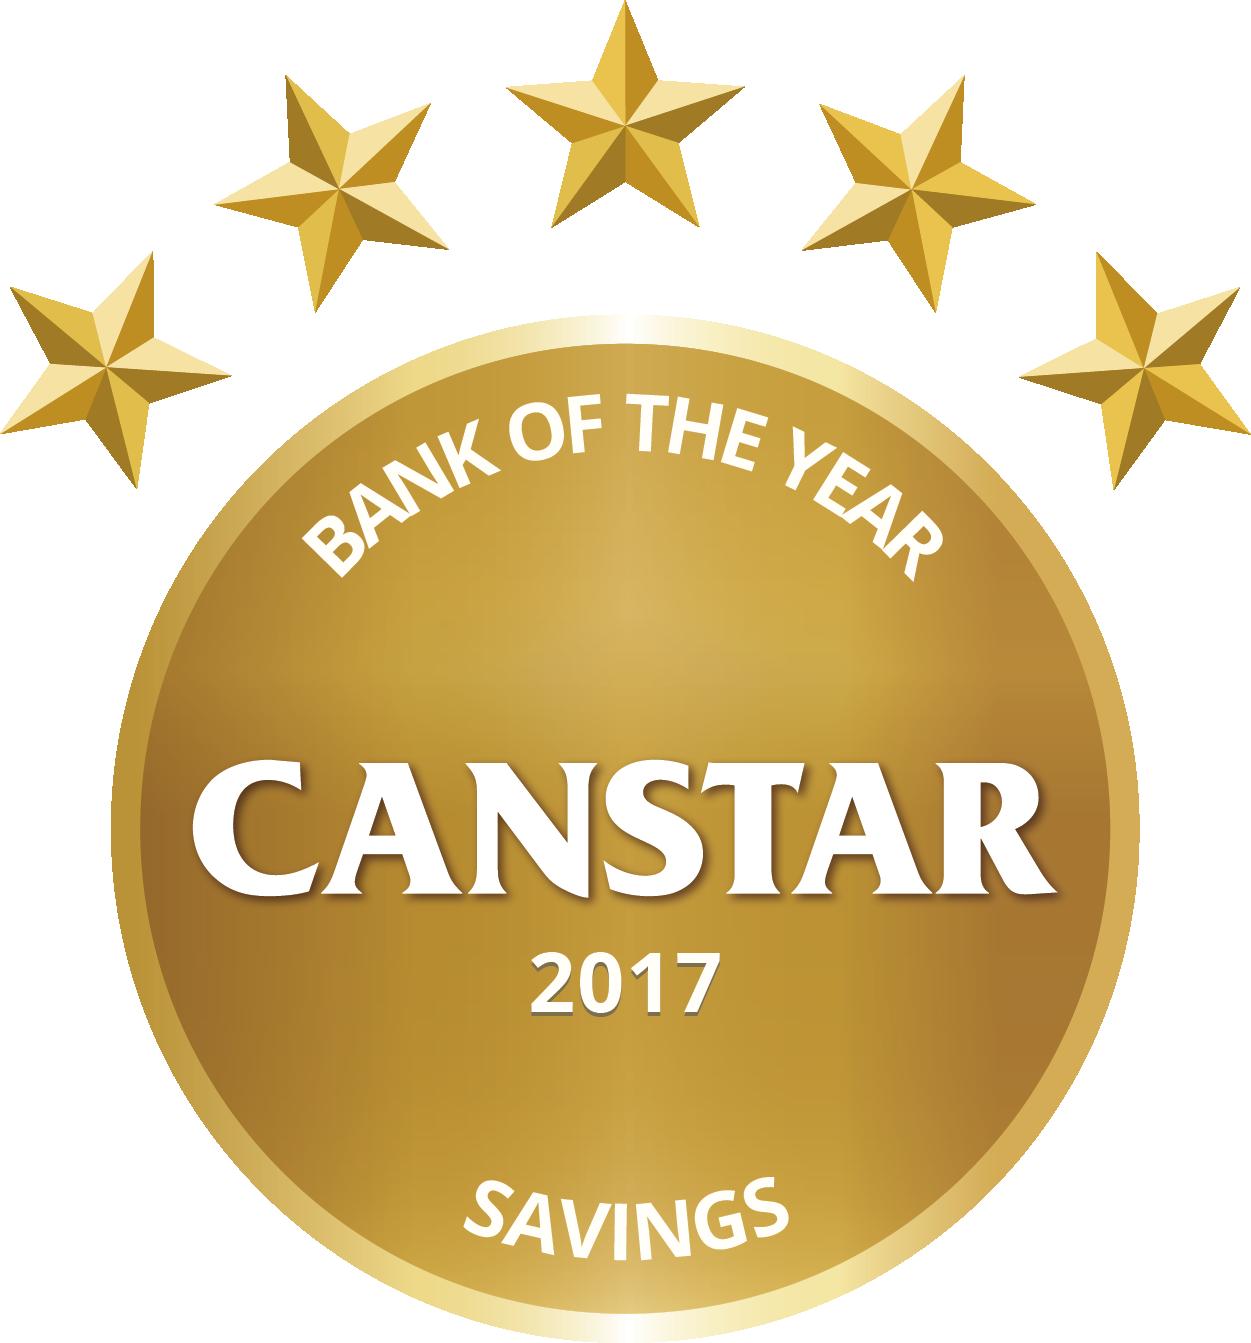 Canstar 2017 - Bank of the Year - Savings